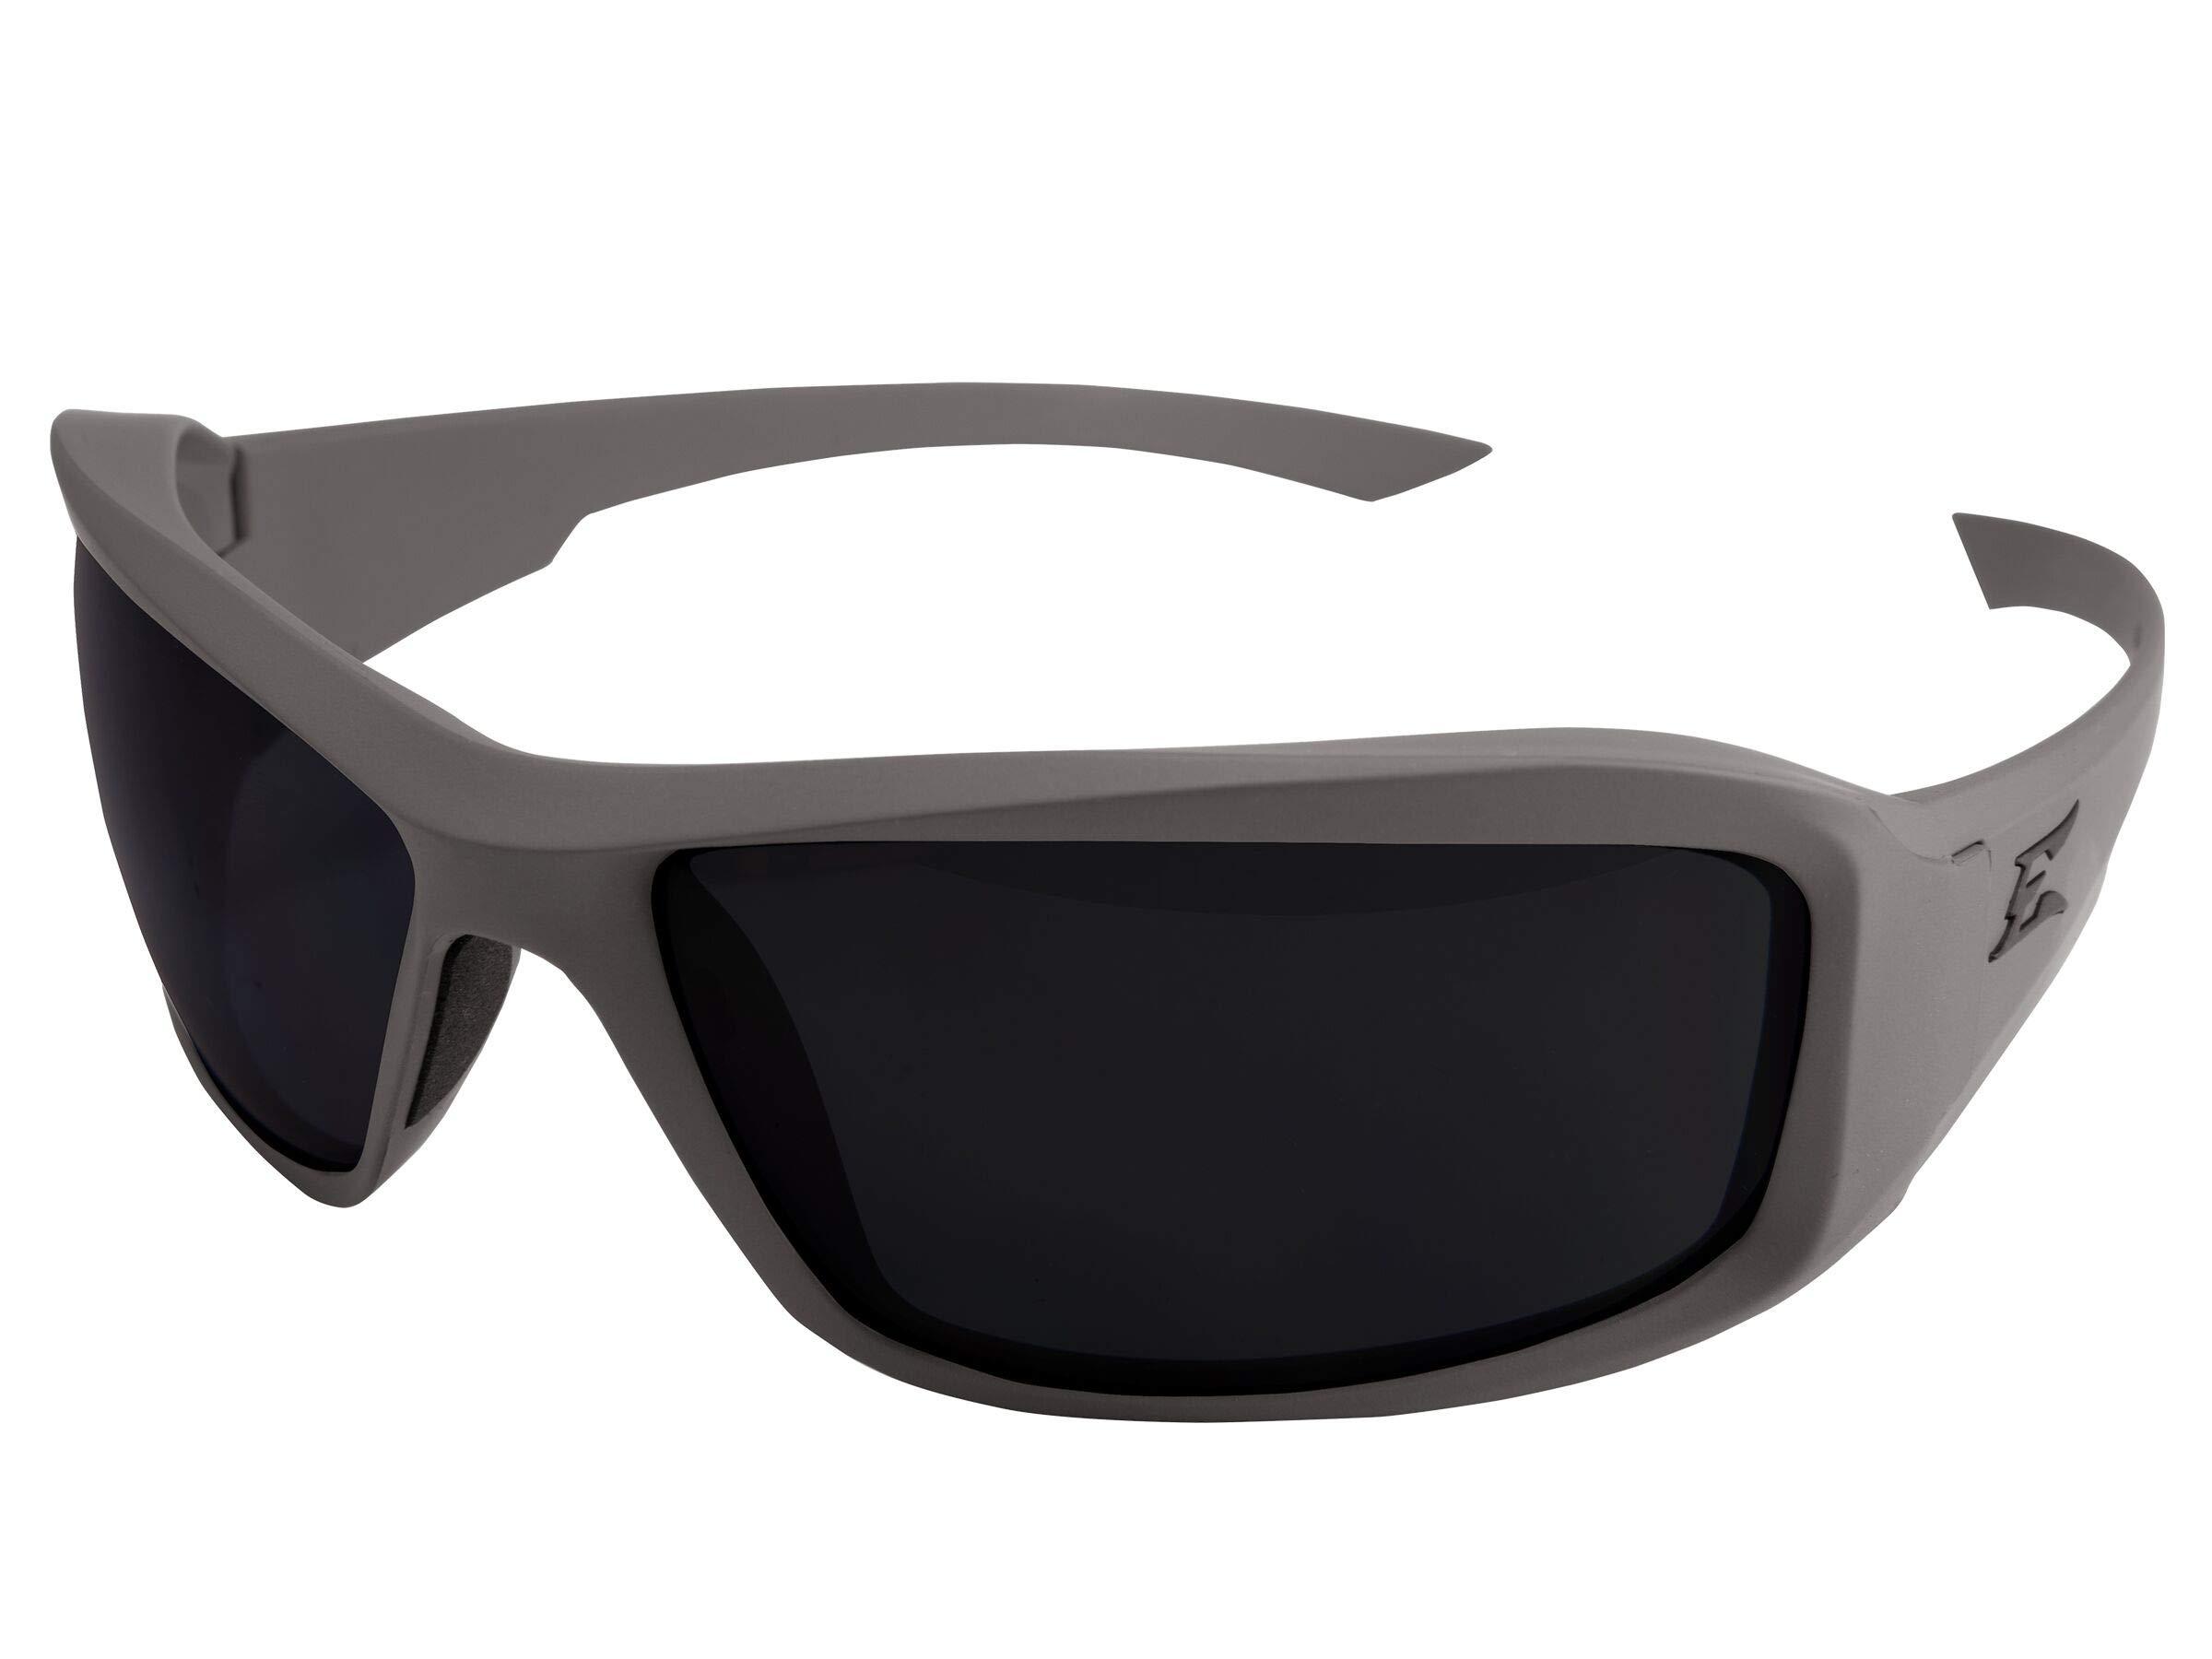 Edge Eyewear TXH746-TT Hamel MAS Gray Thin Temple - Soft-Touch Gray Frame/Polarized Smoke Lenses by Edge Eyewear